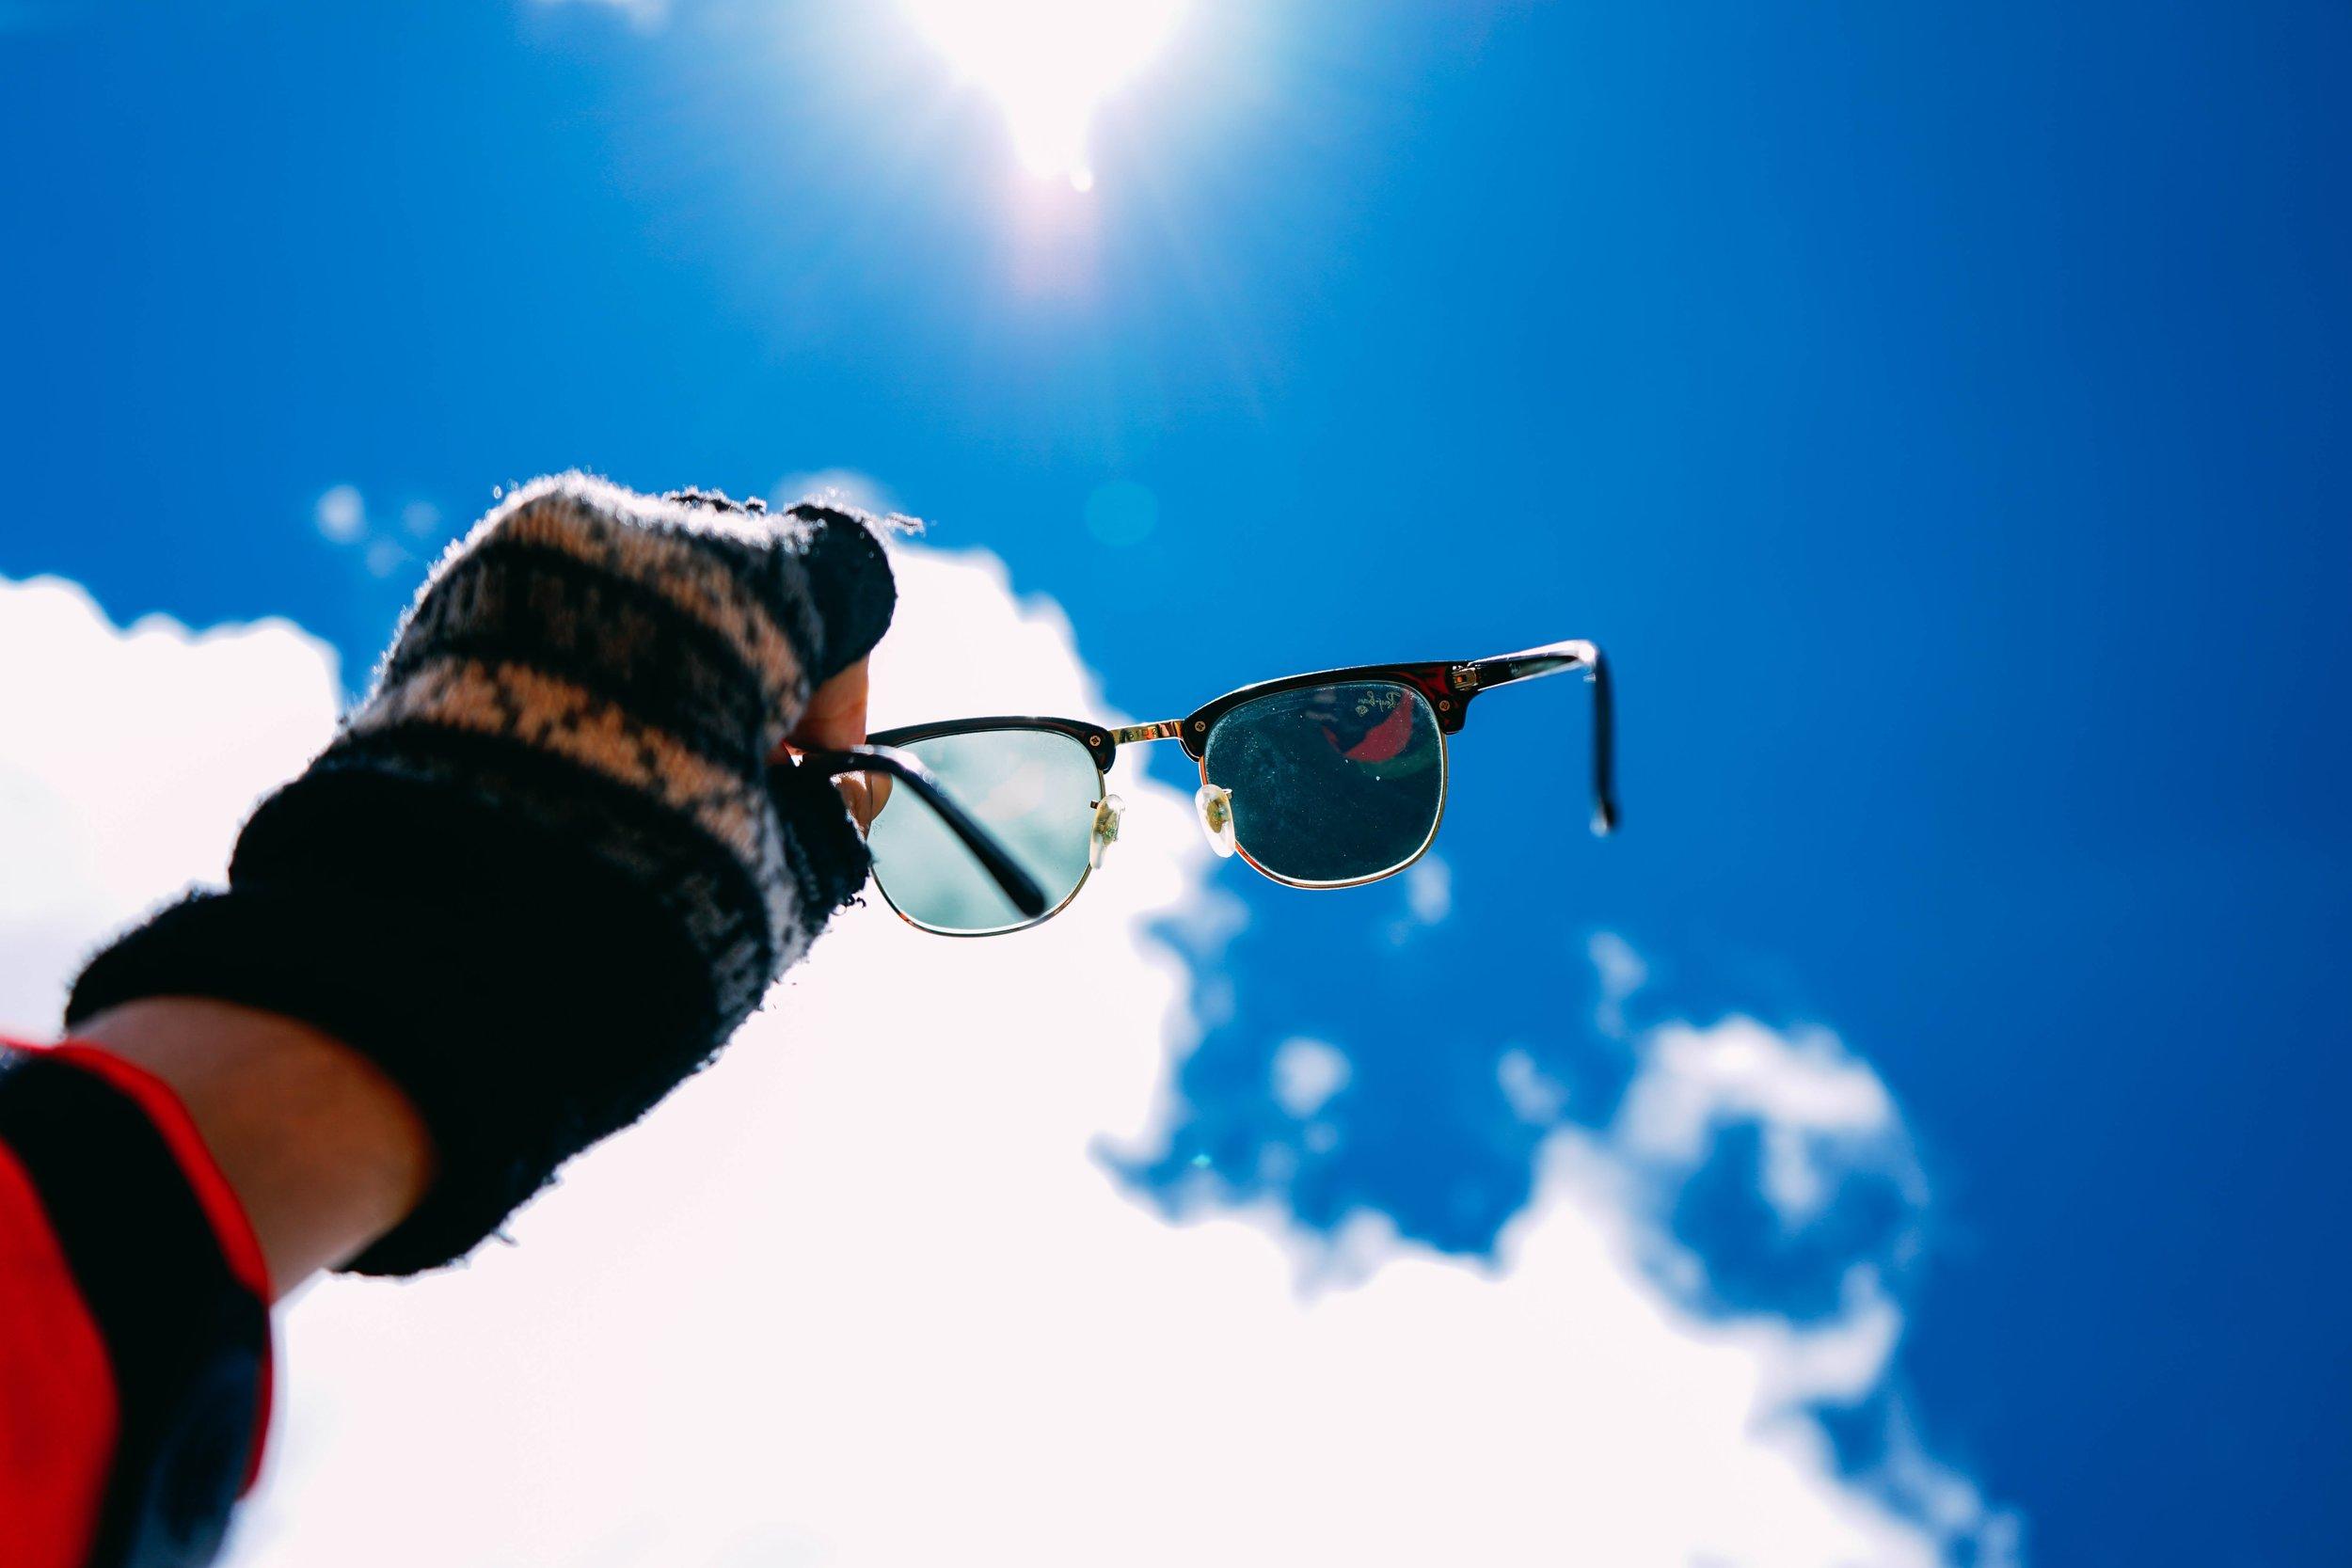 Nepal_sunglasses_unsplash.jpg